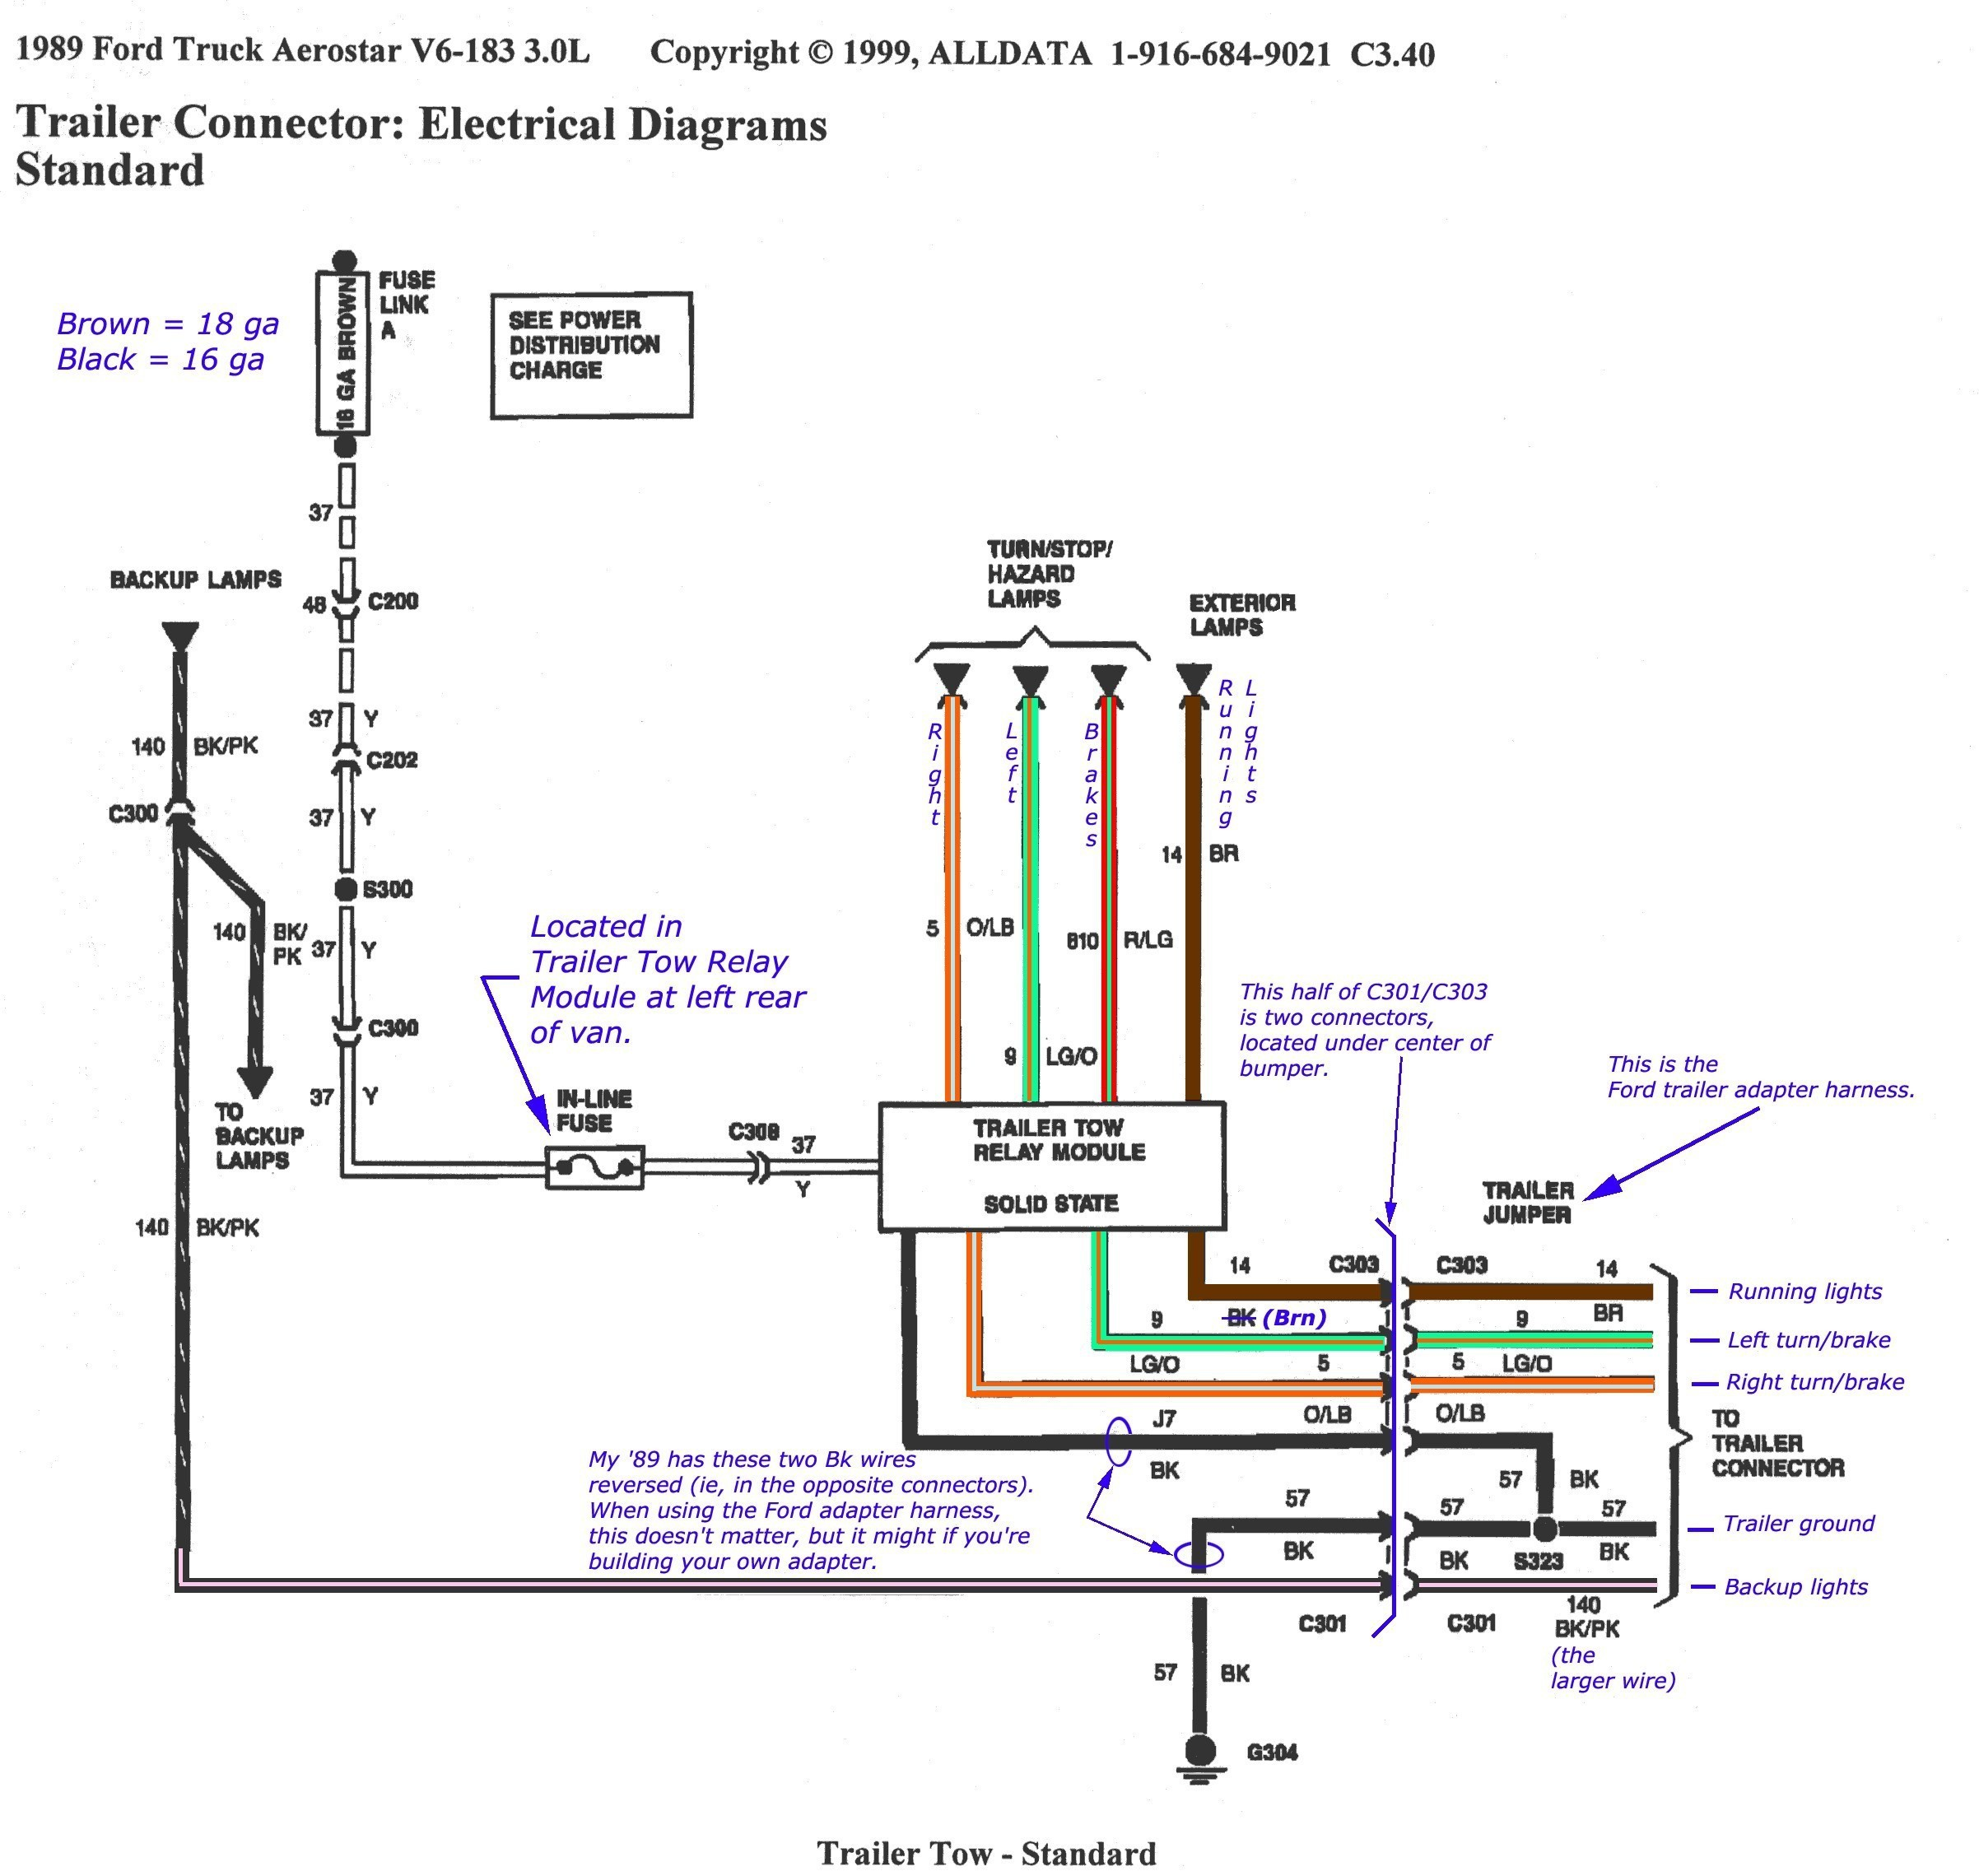 Trailer Breakaway Wiring Diagram 5 Pin Trailer Wiring Diagram Awesome Wiring Diagram Big Tex Trailer Of Trailer Breakaway Wiring Diagram